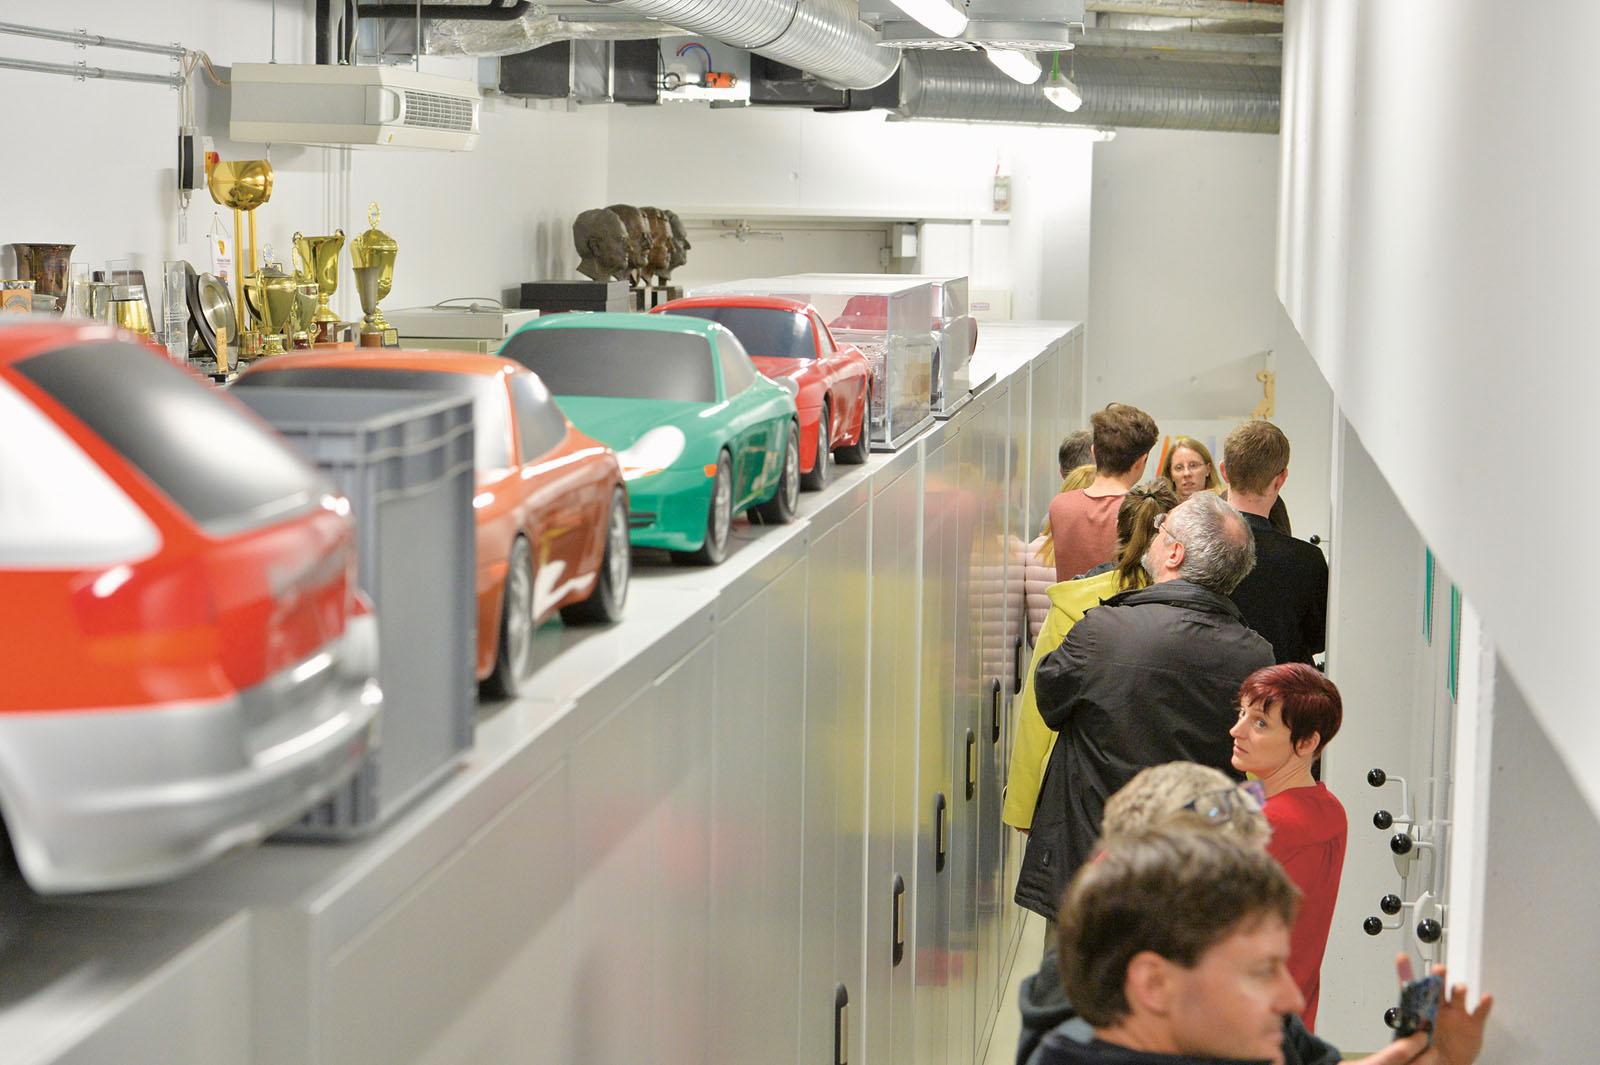 Lange Nacht der Museen Stuttgart - Porsche Museum 2016